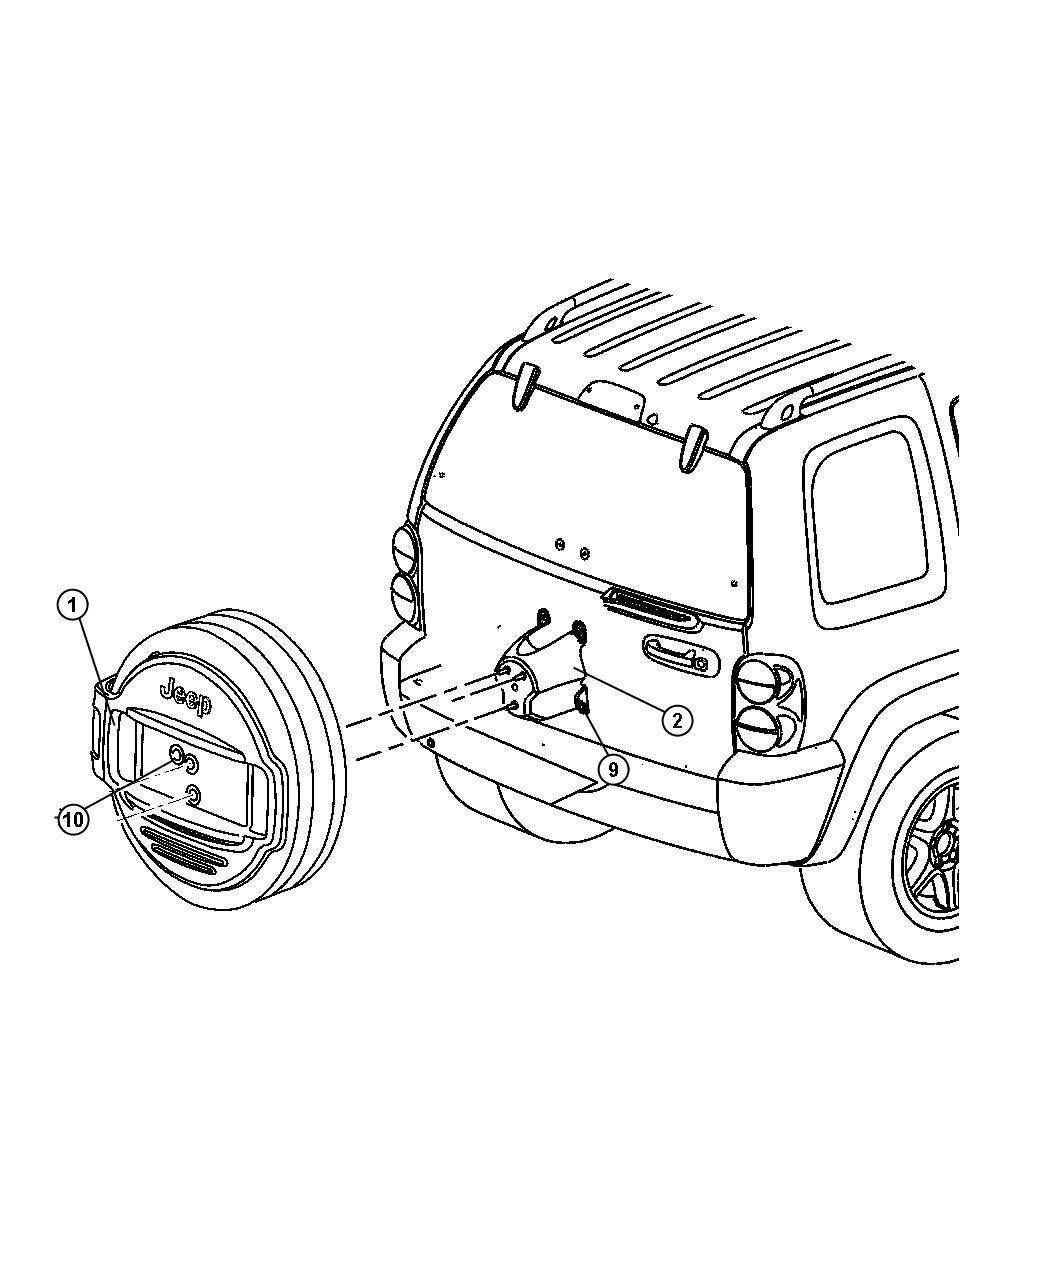 Jeep Liberty Transmission Control Module Sketch